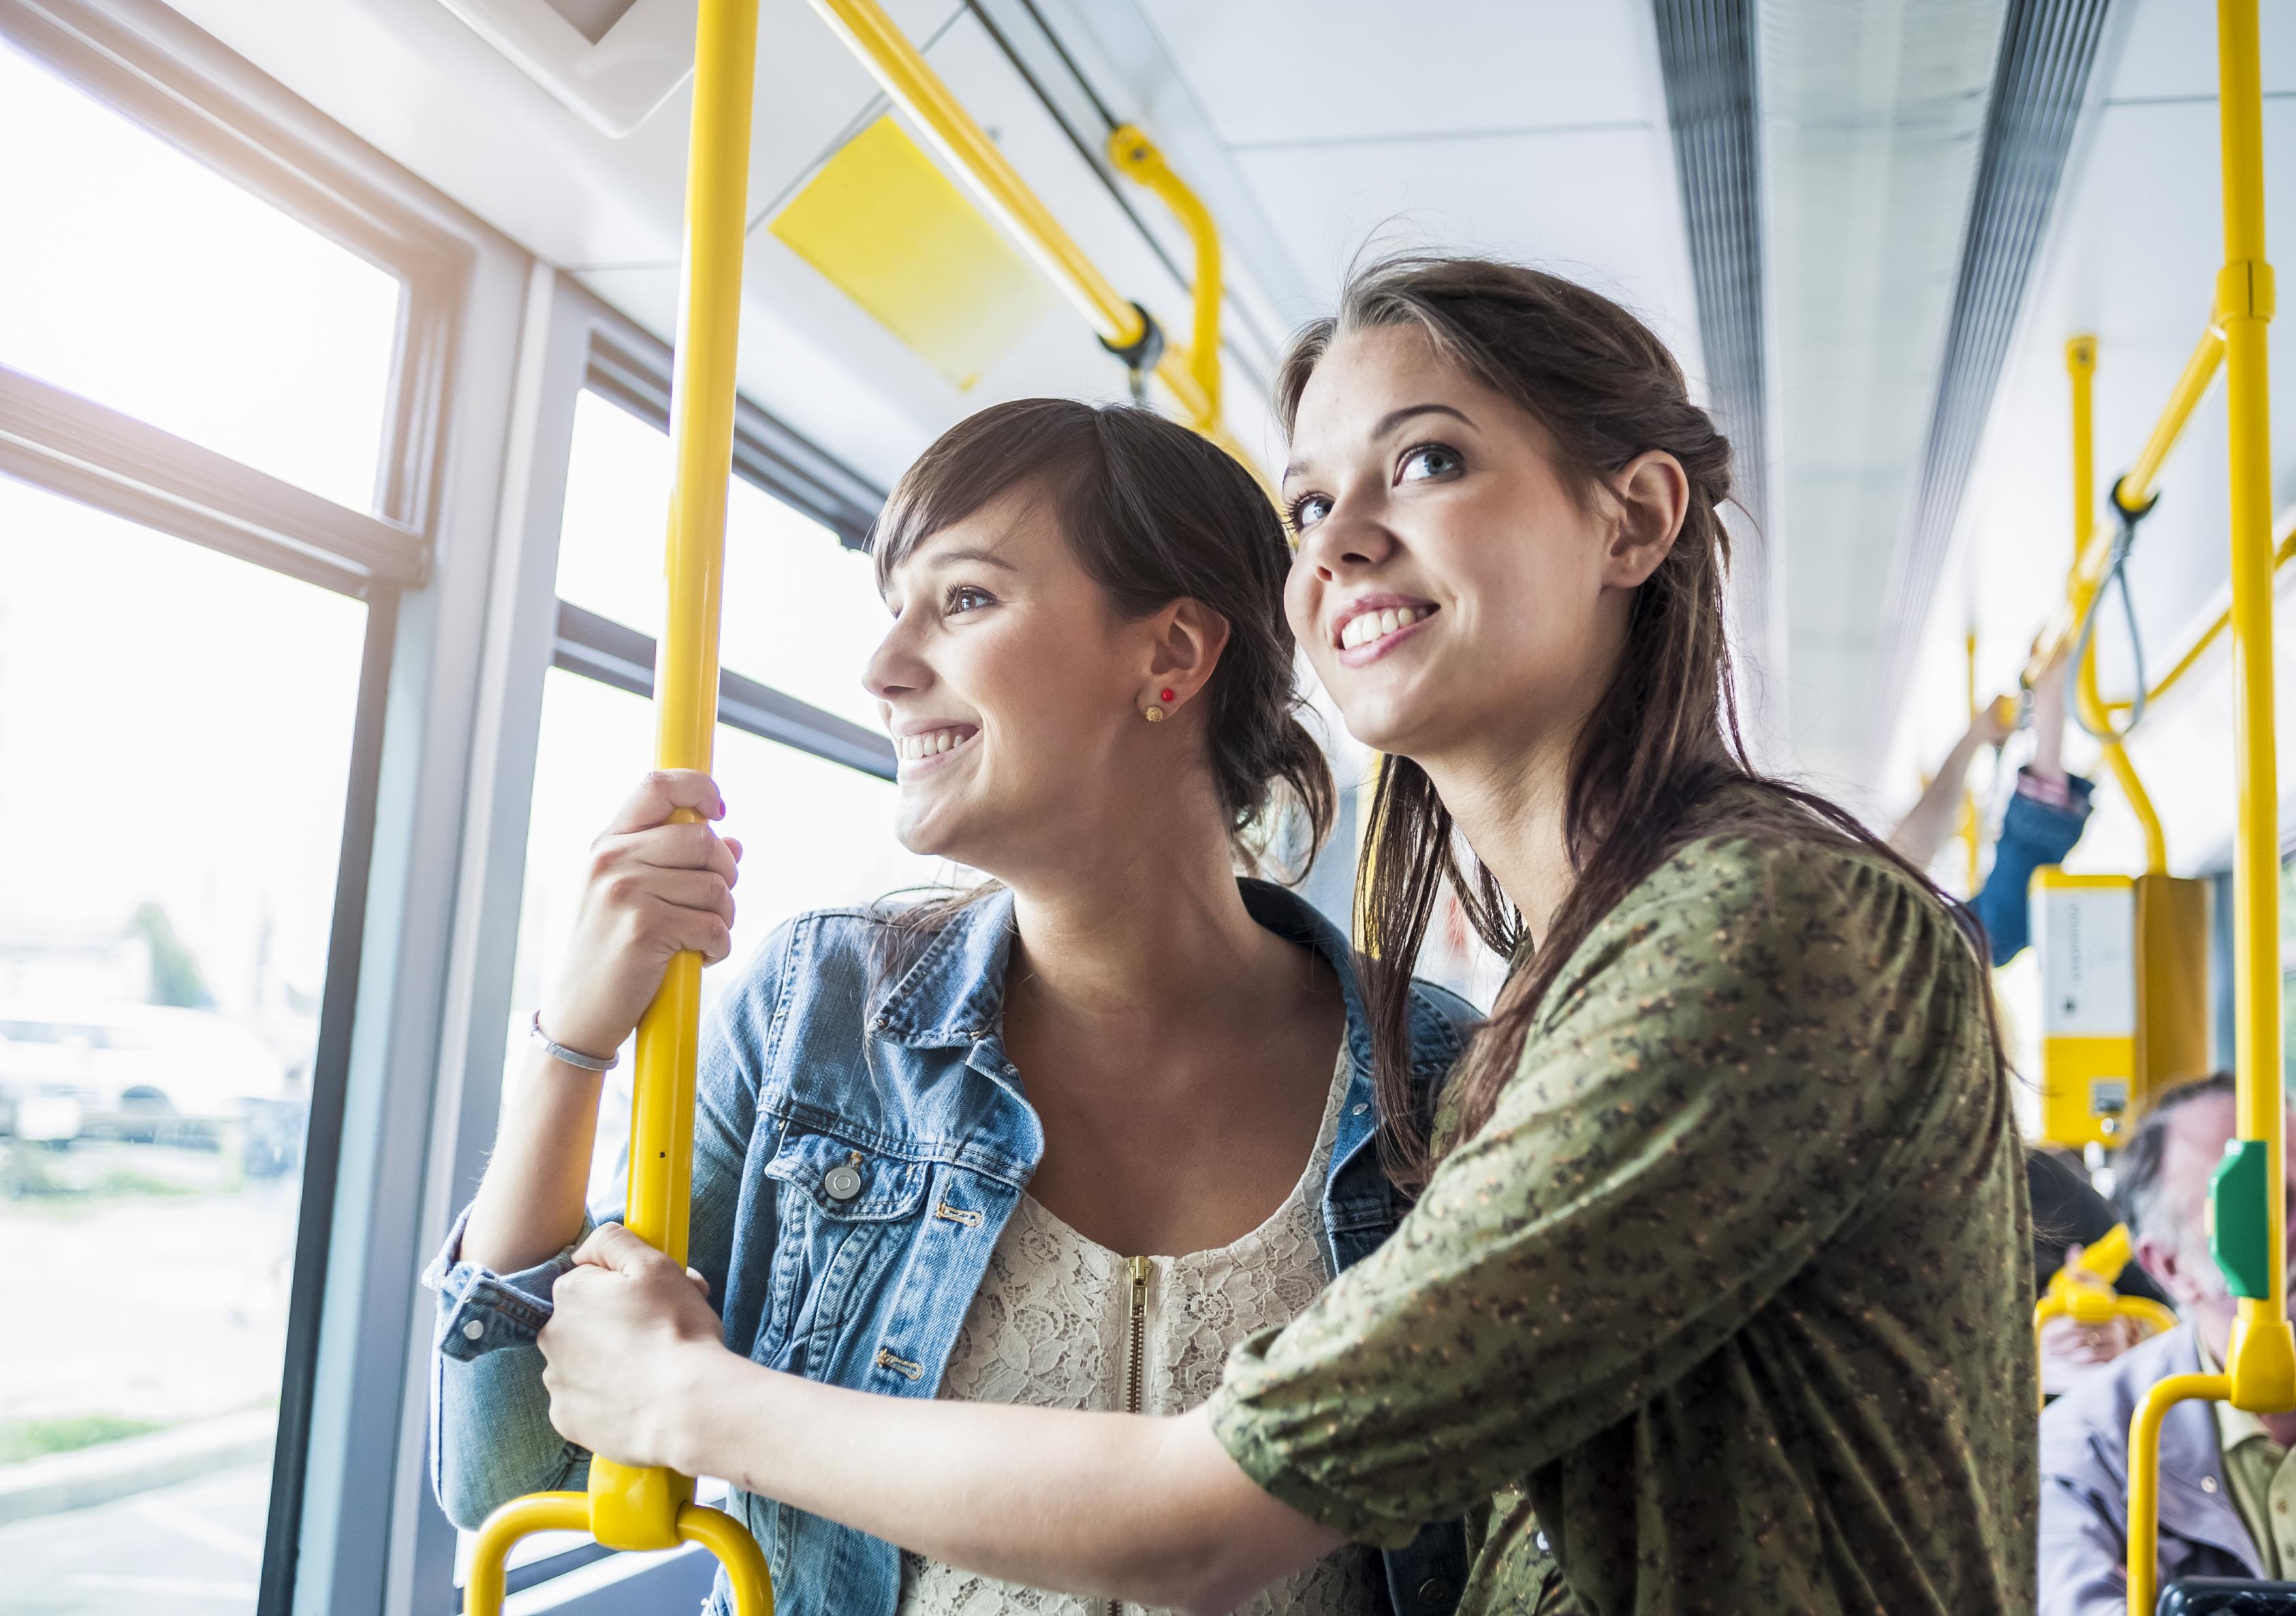 Salzburg launches new mobility planning concept (Austria)